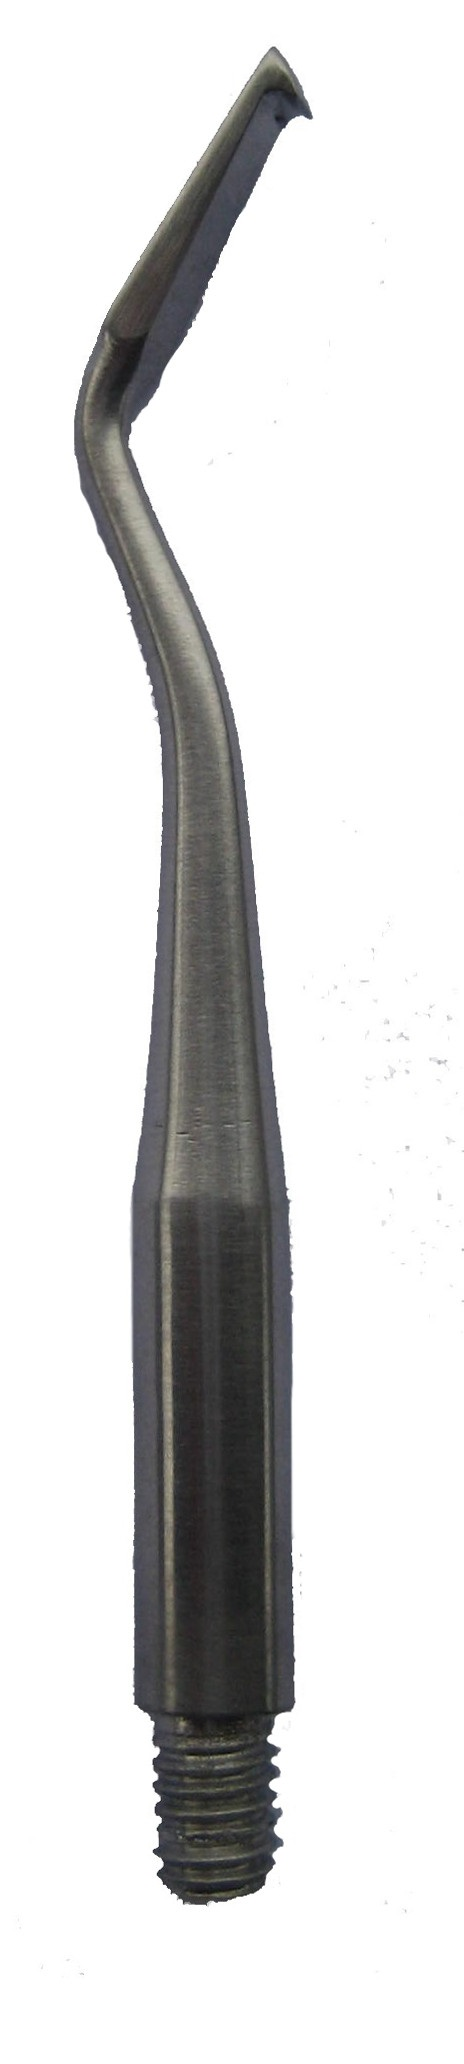 K.101.02-Punta-angolata-30°.jpg